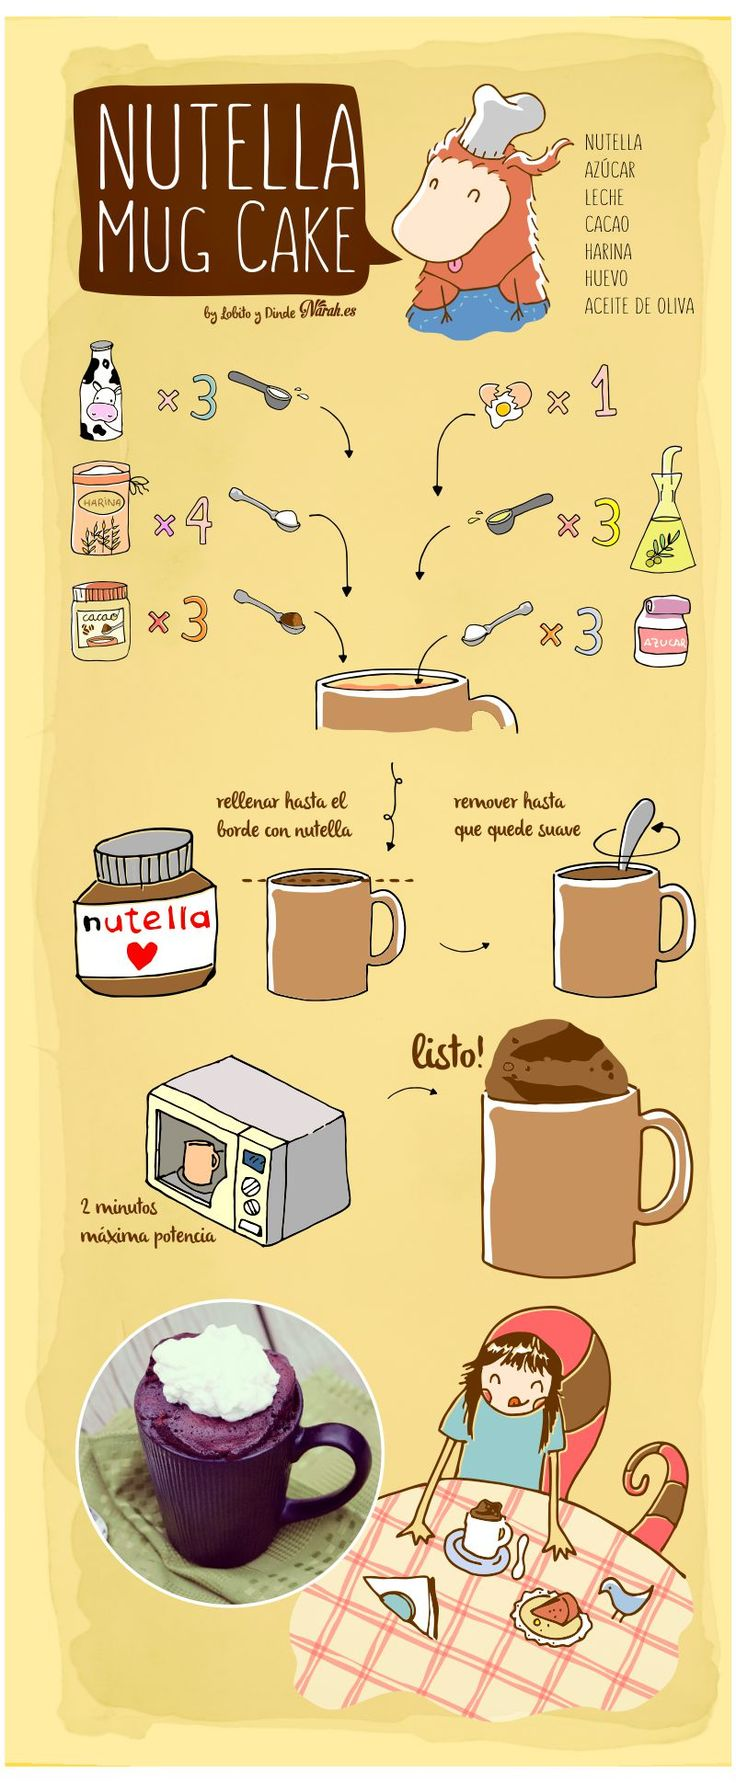 receta nutella mug cake enterita